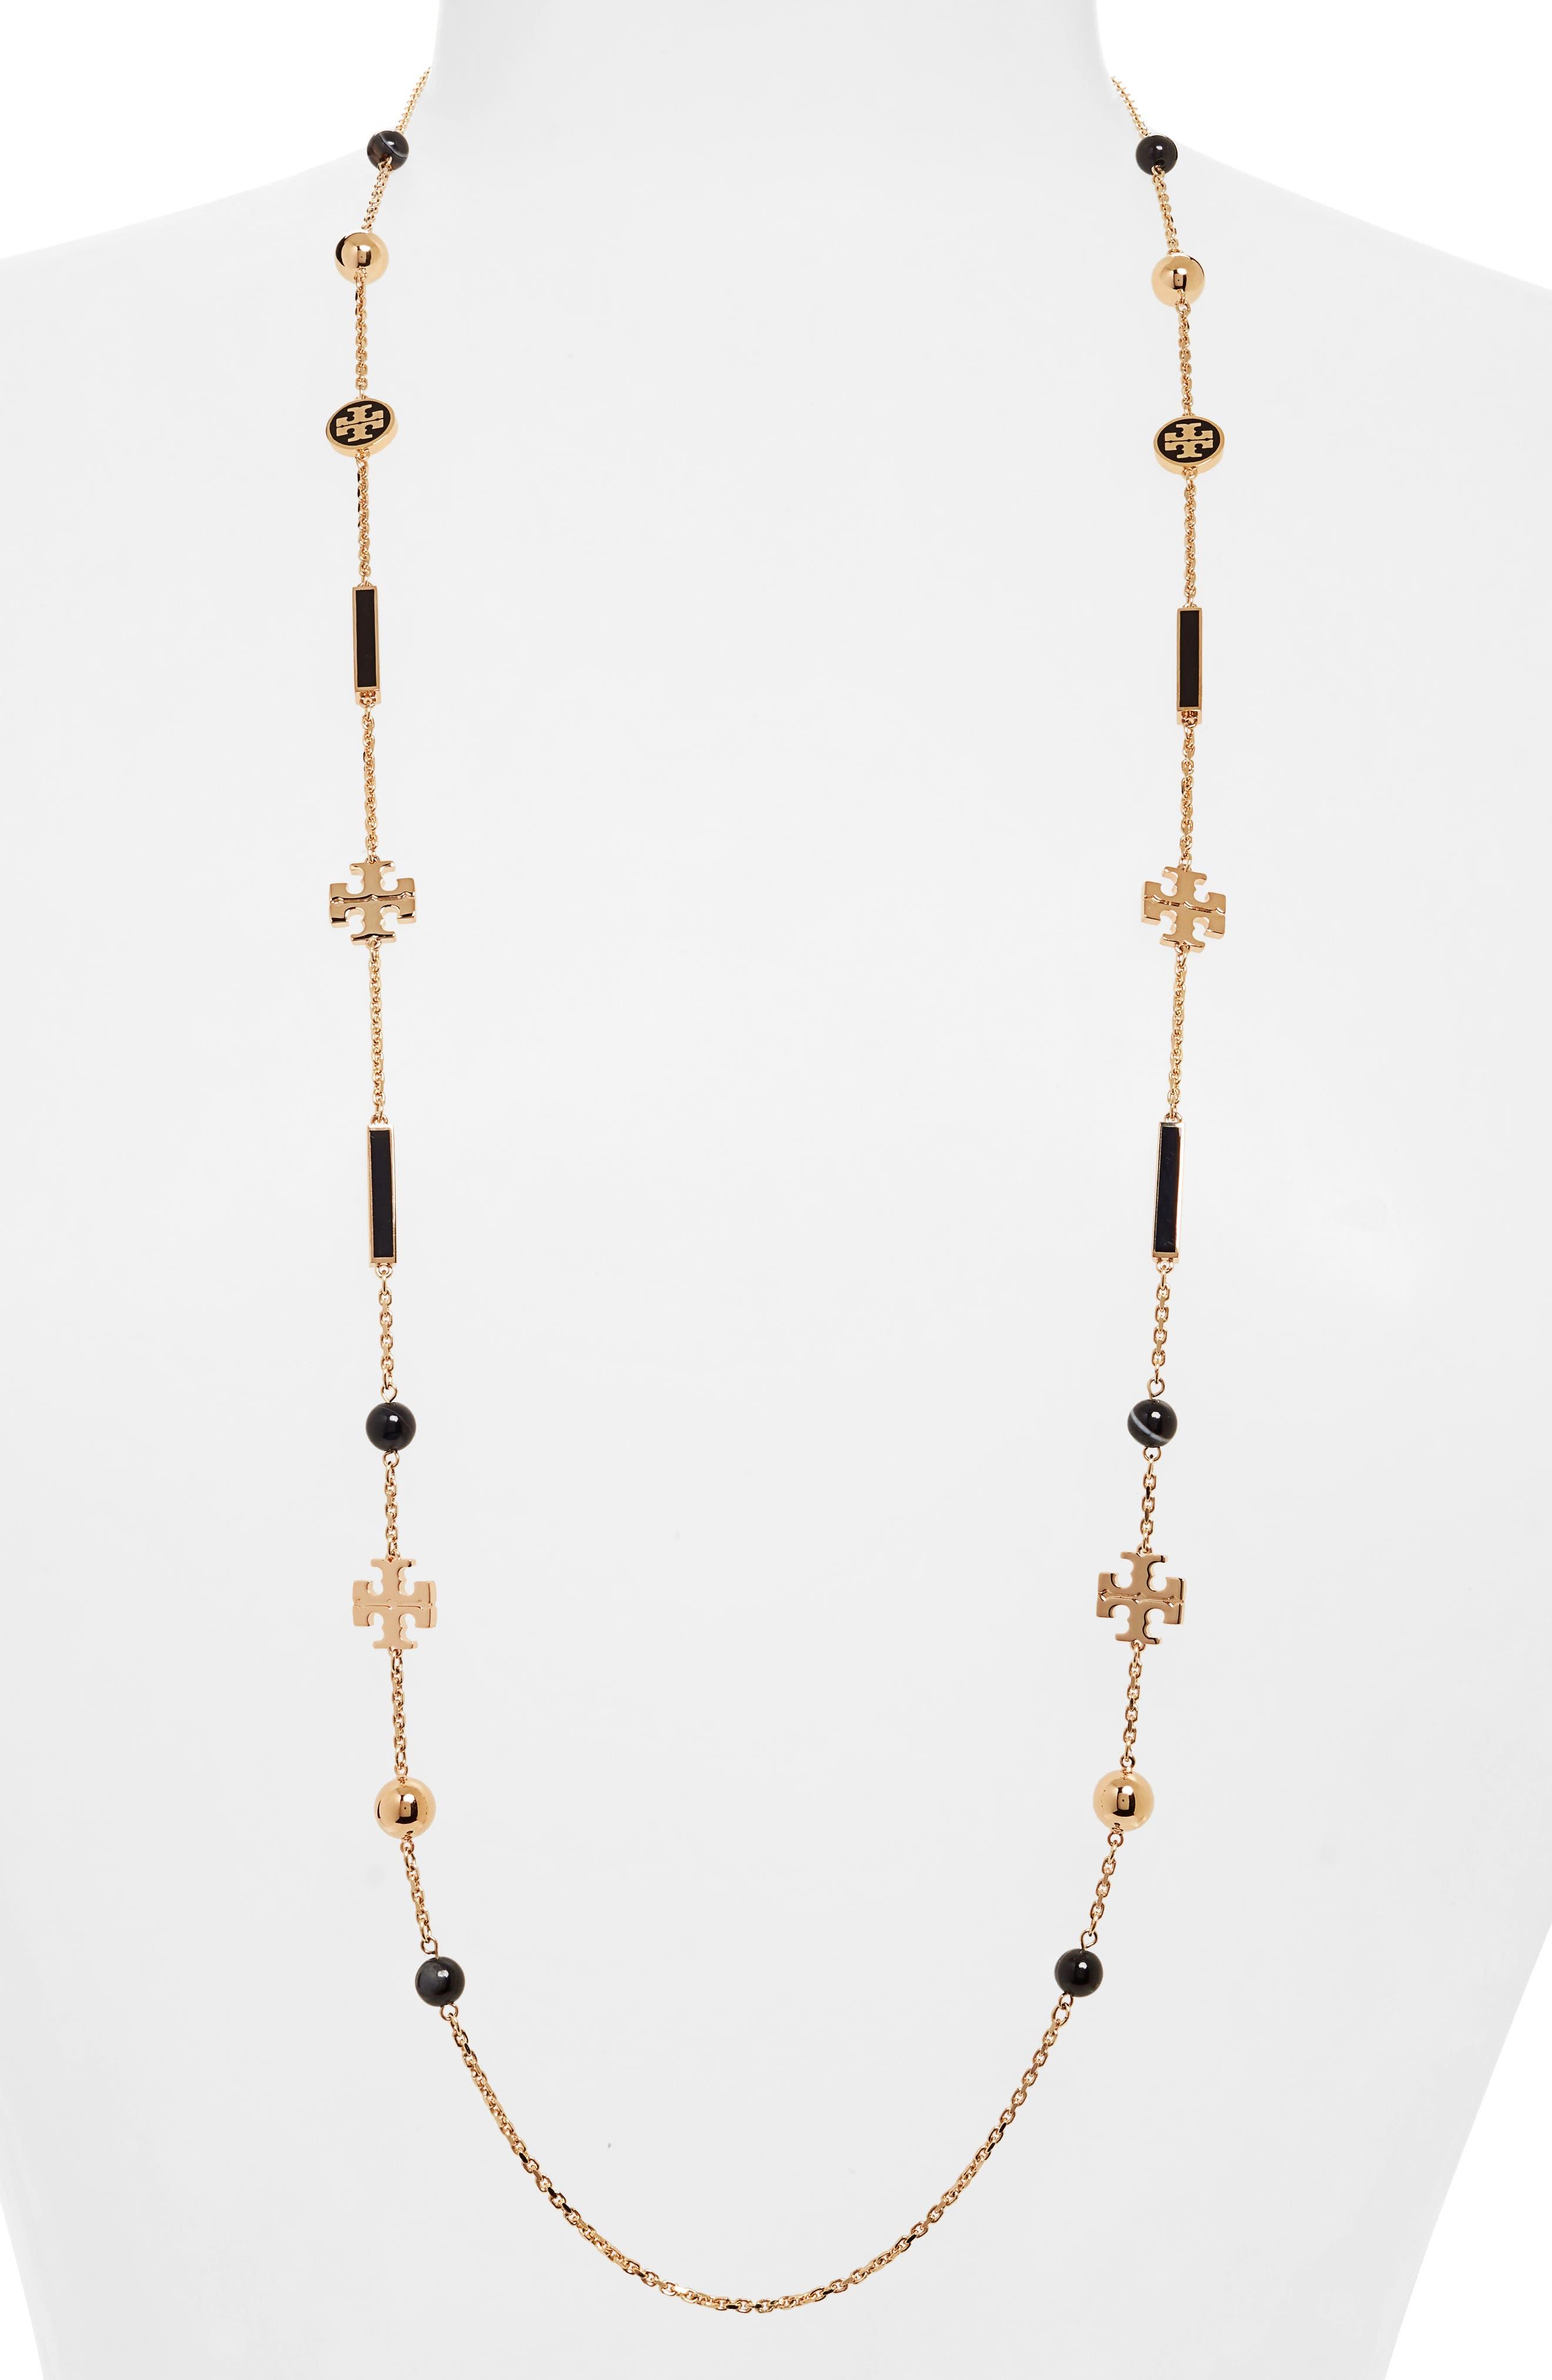 Tory Burch Women S Jewelry